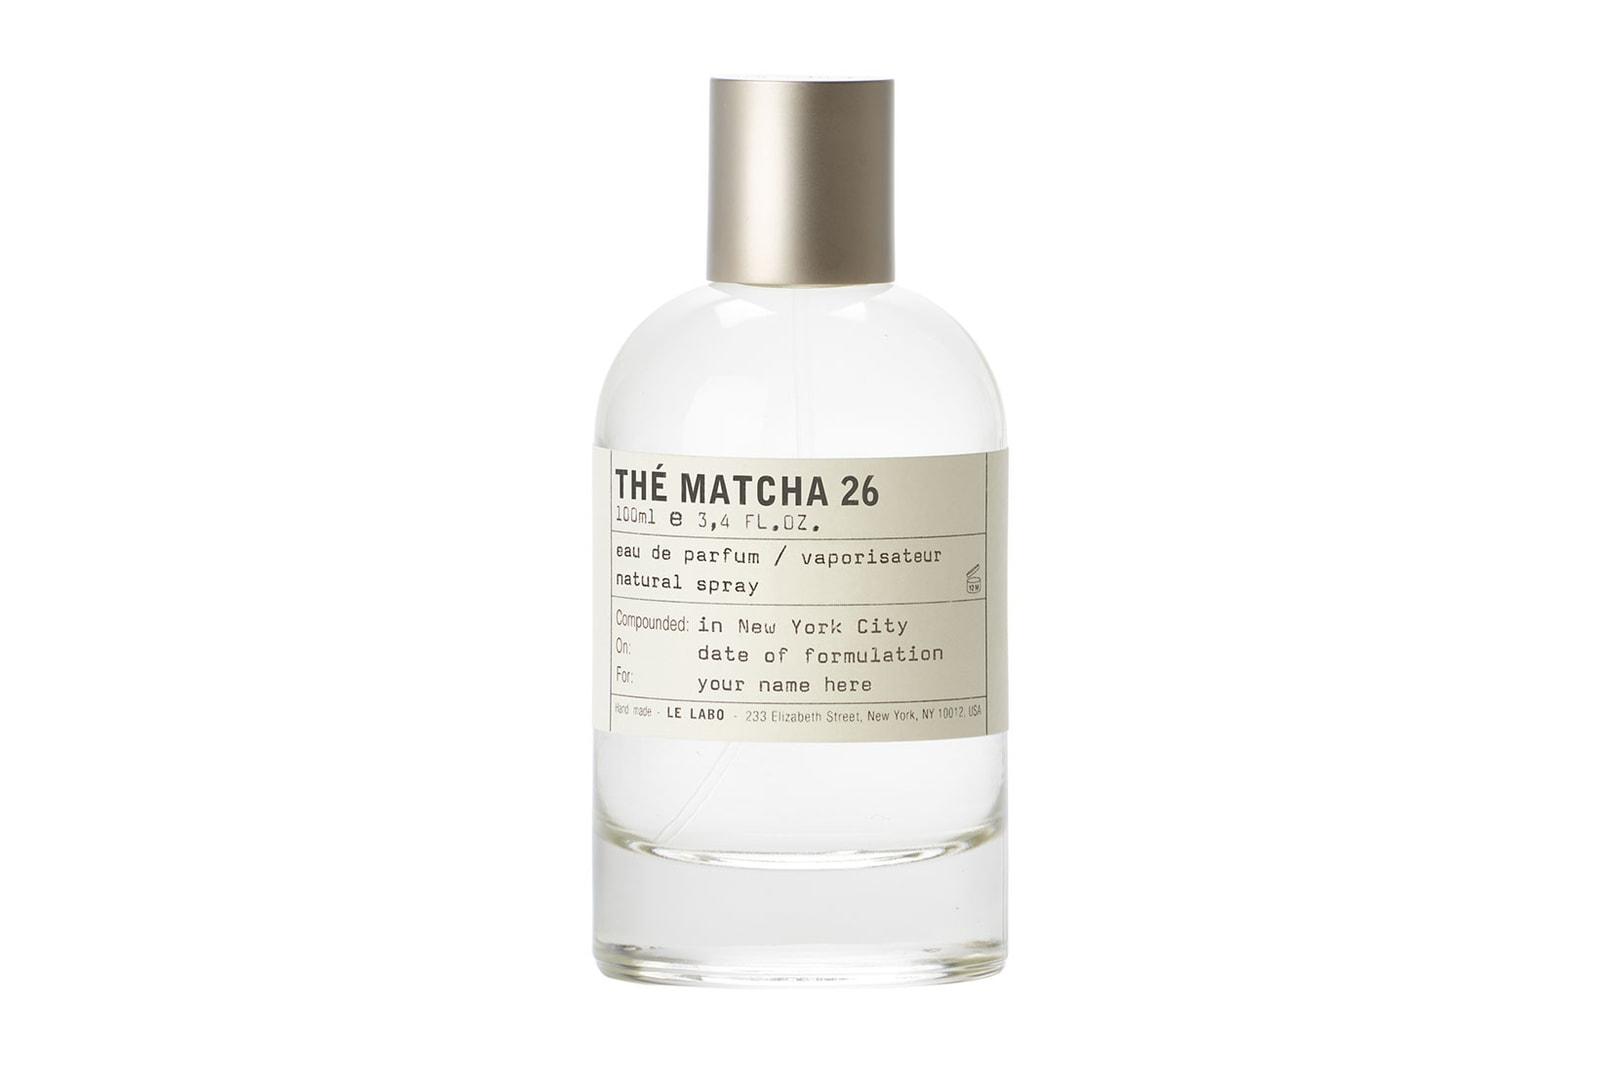 Le Labo THÉ MATCHA 26 Perfume Fragrance Scent Bottle Label